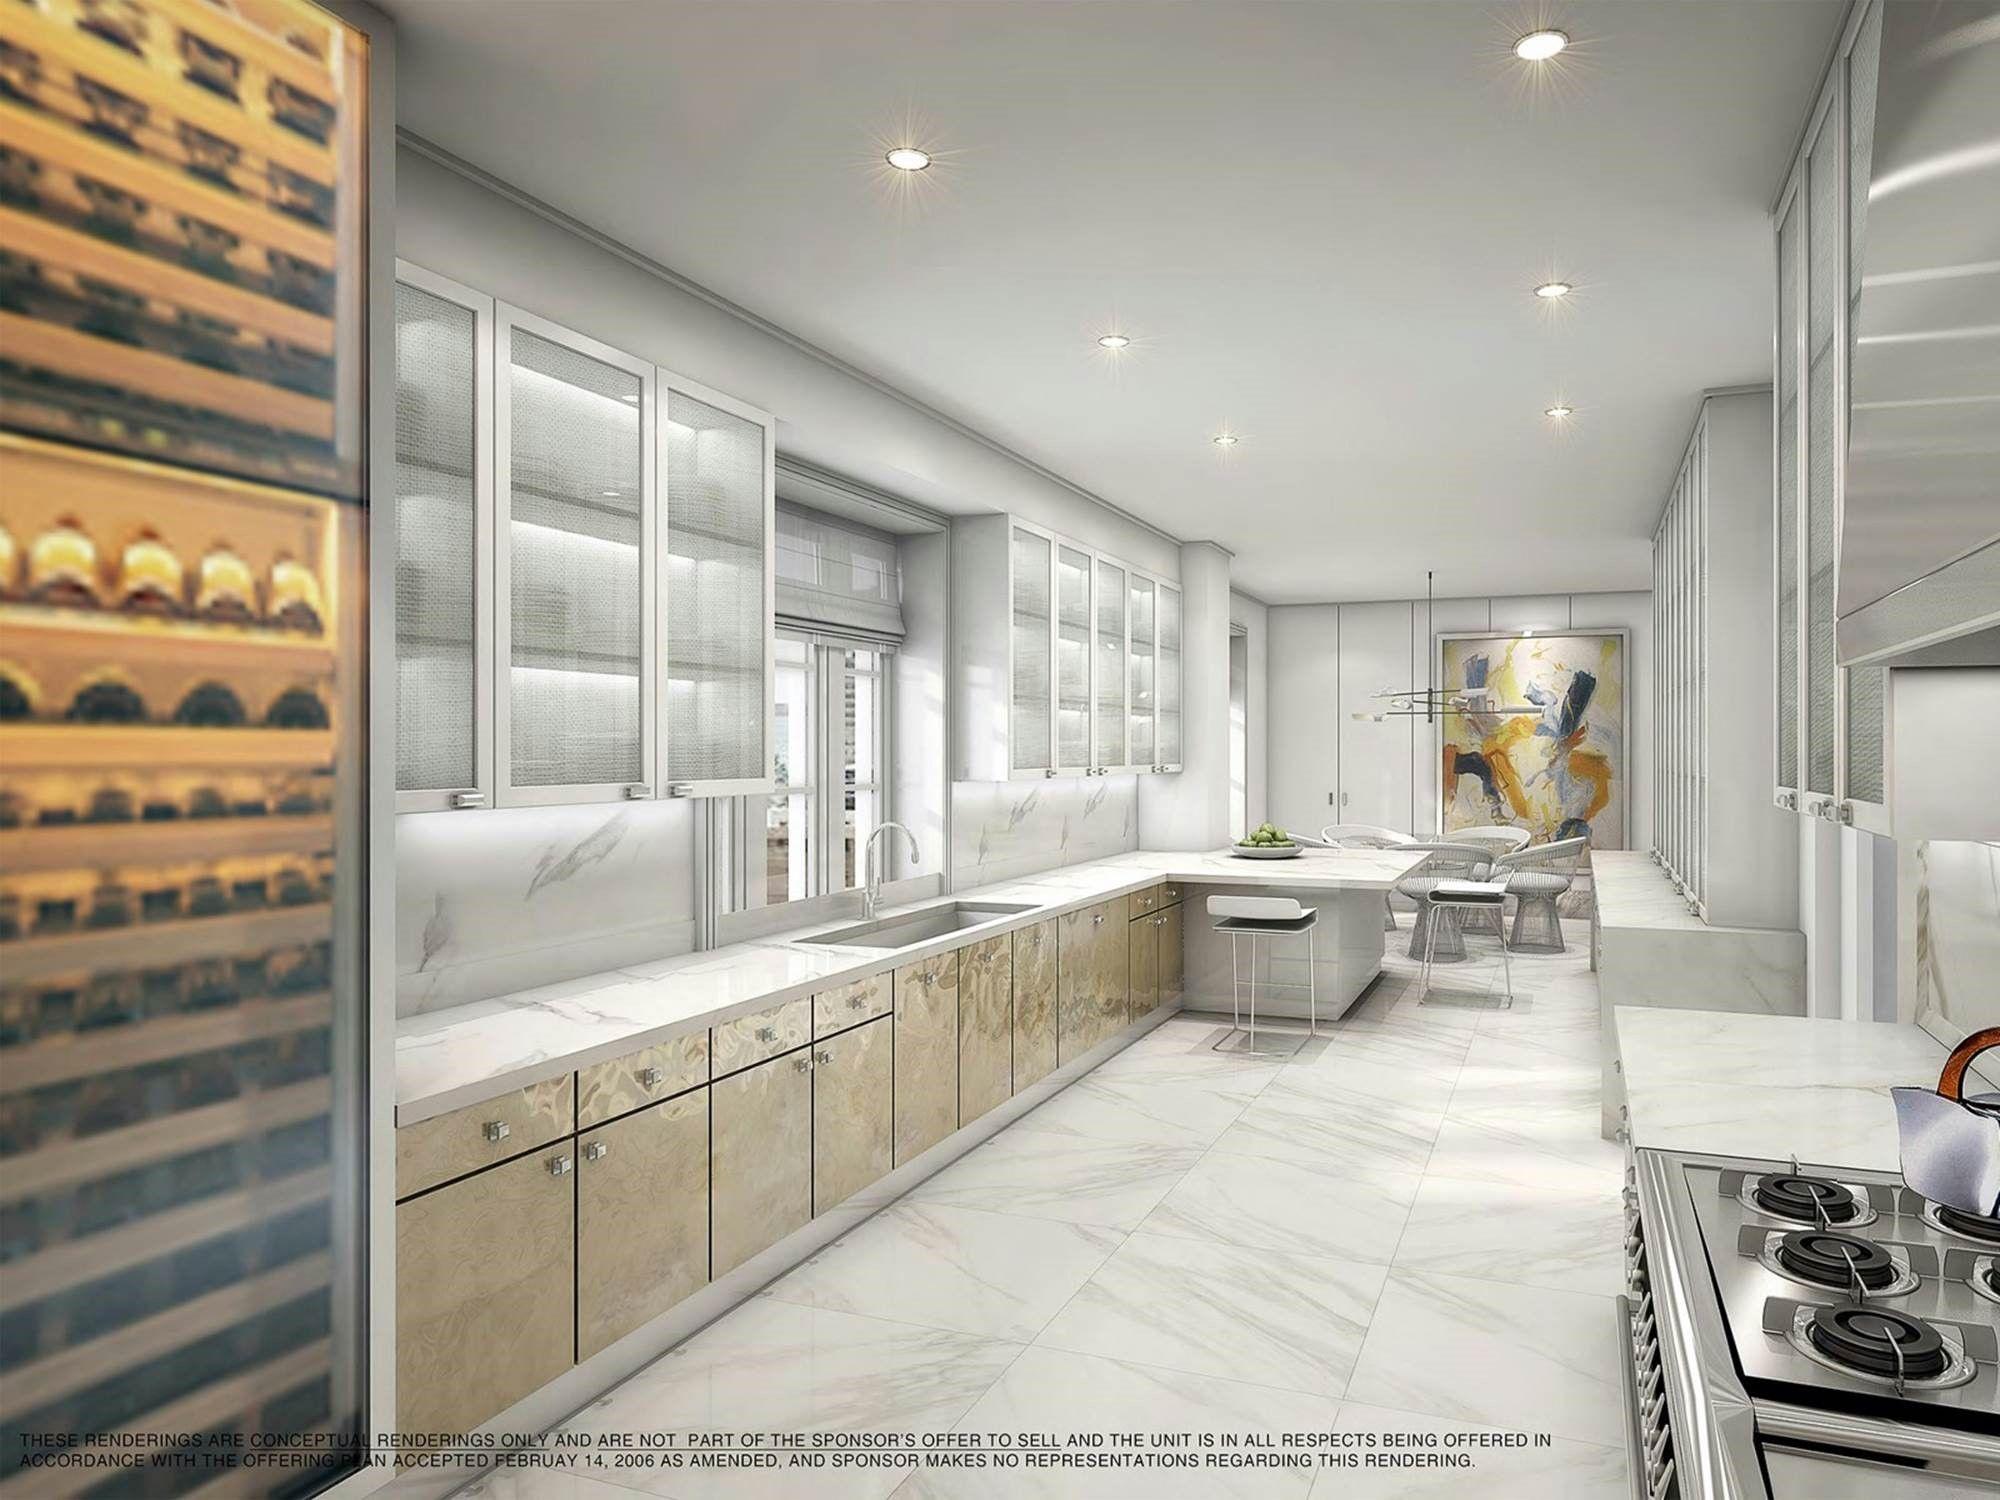 Lower kitchen cabinets ranch house ideas pinterest kitchens